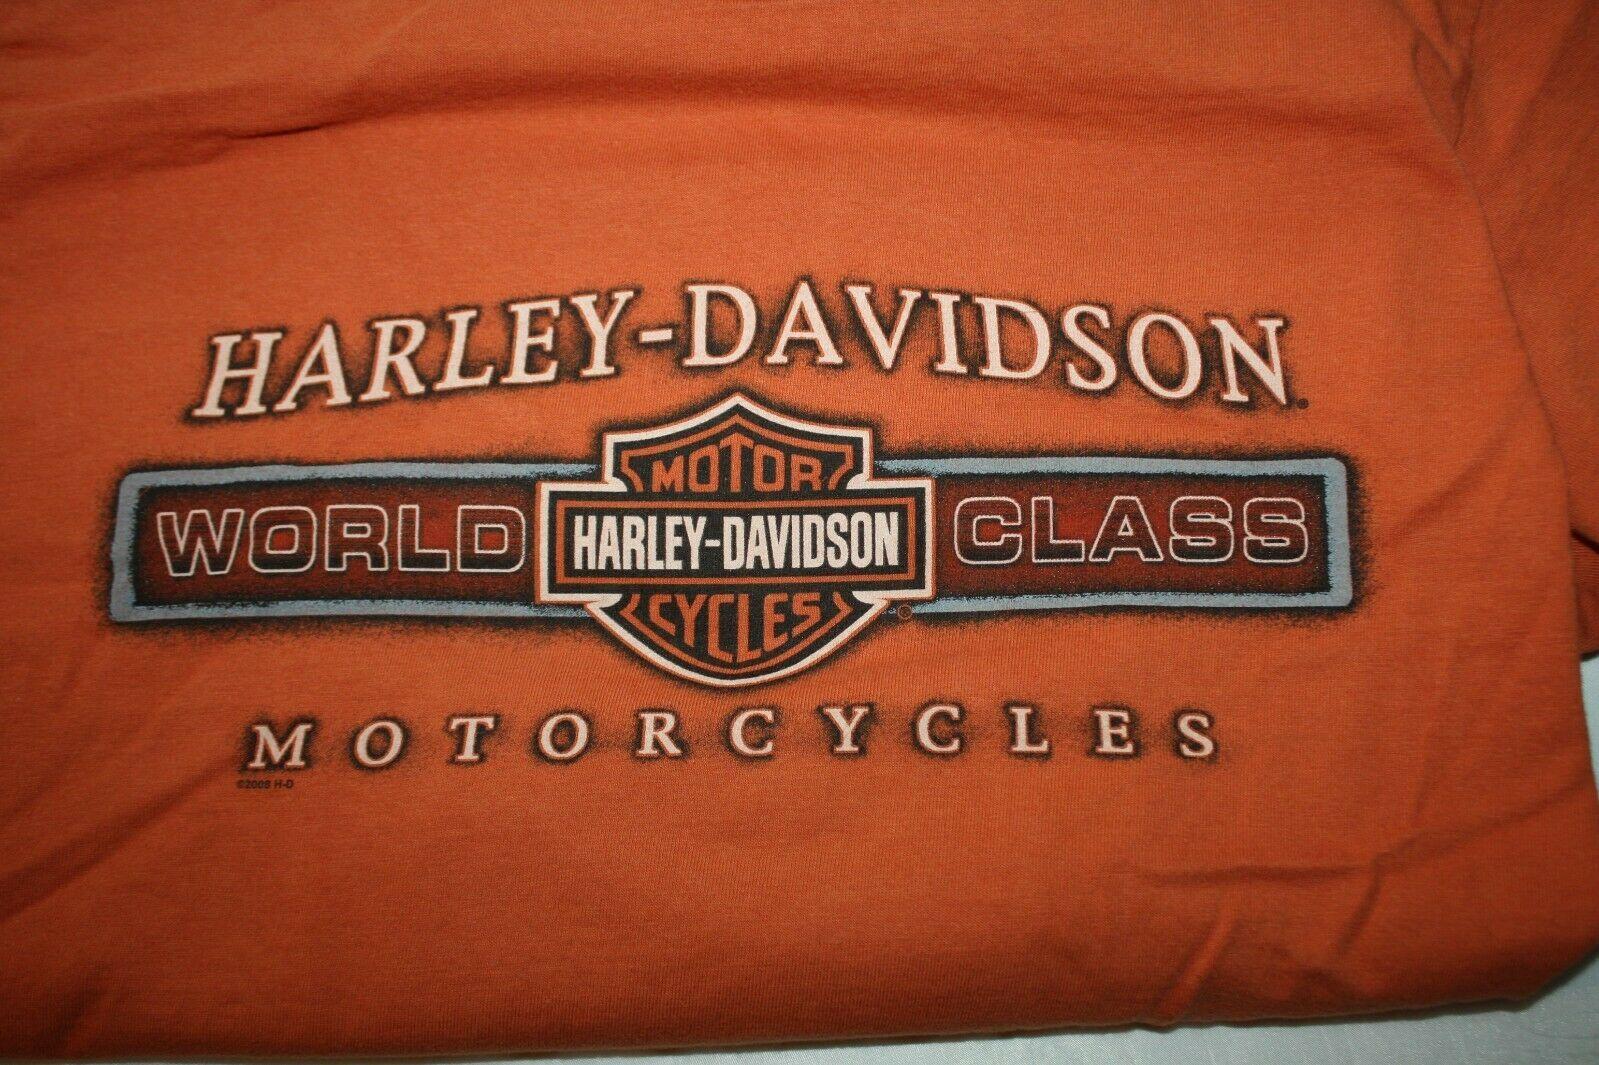 Harley Davidson Mens T-Shirt Orange Battlefield Harley Gettysburgh PA Size Small image 2